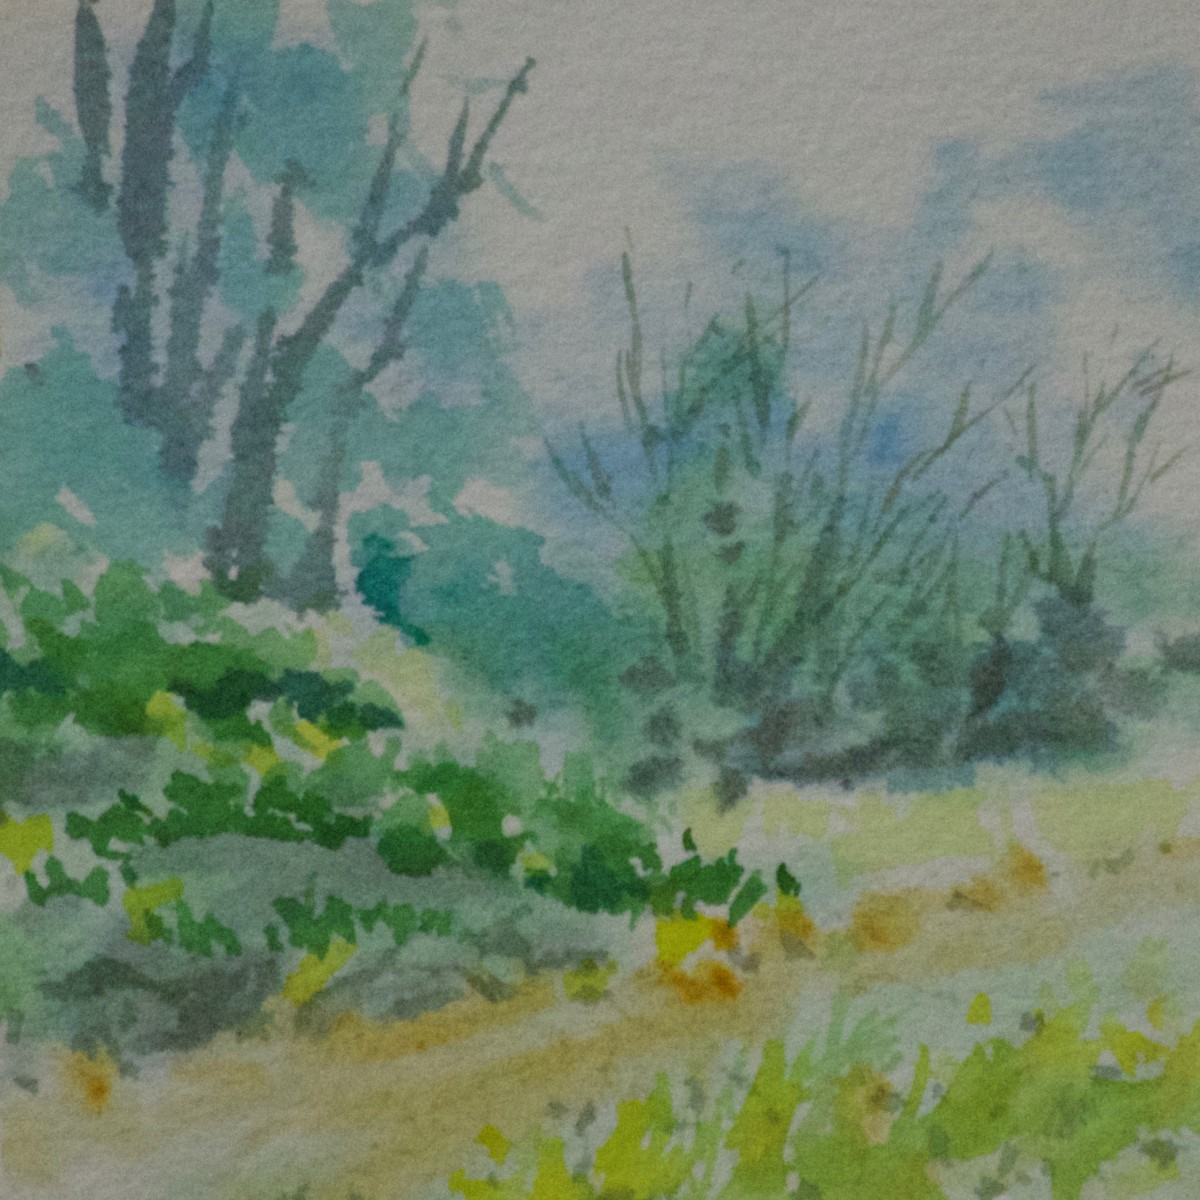 Along the Way by Linda Eades Blackburn